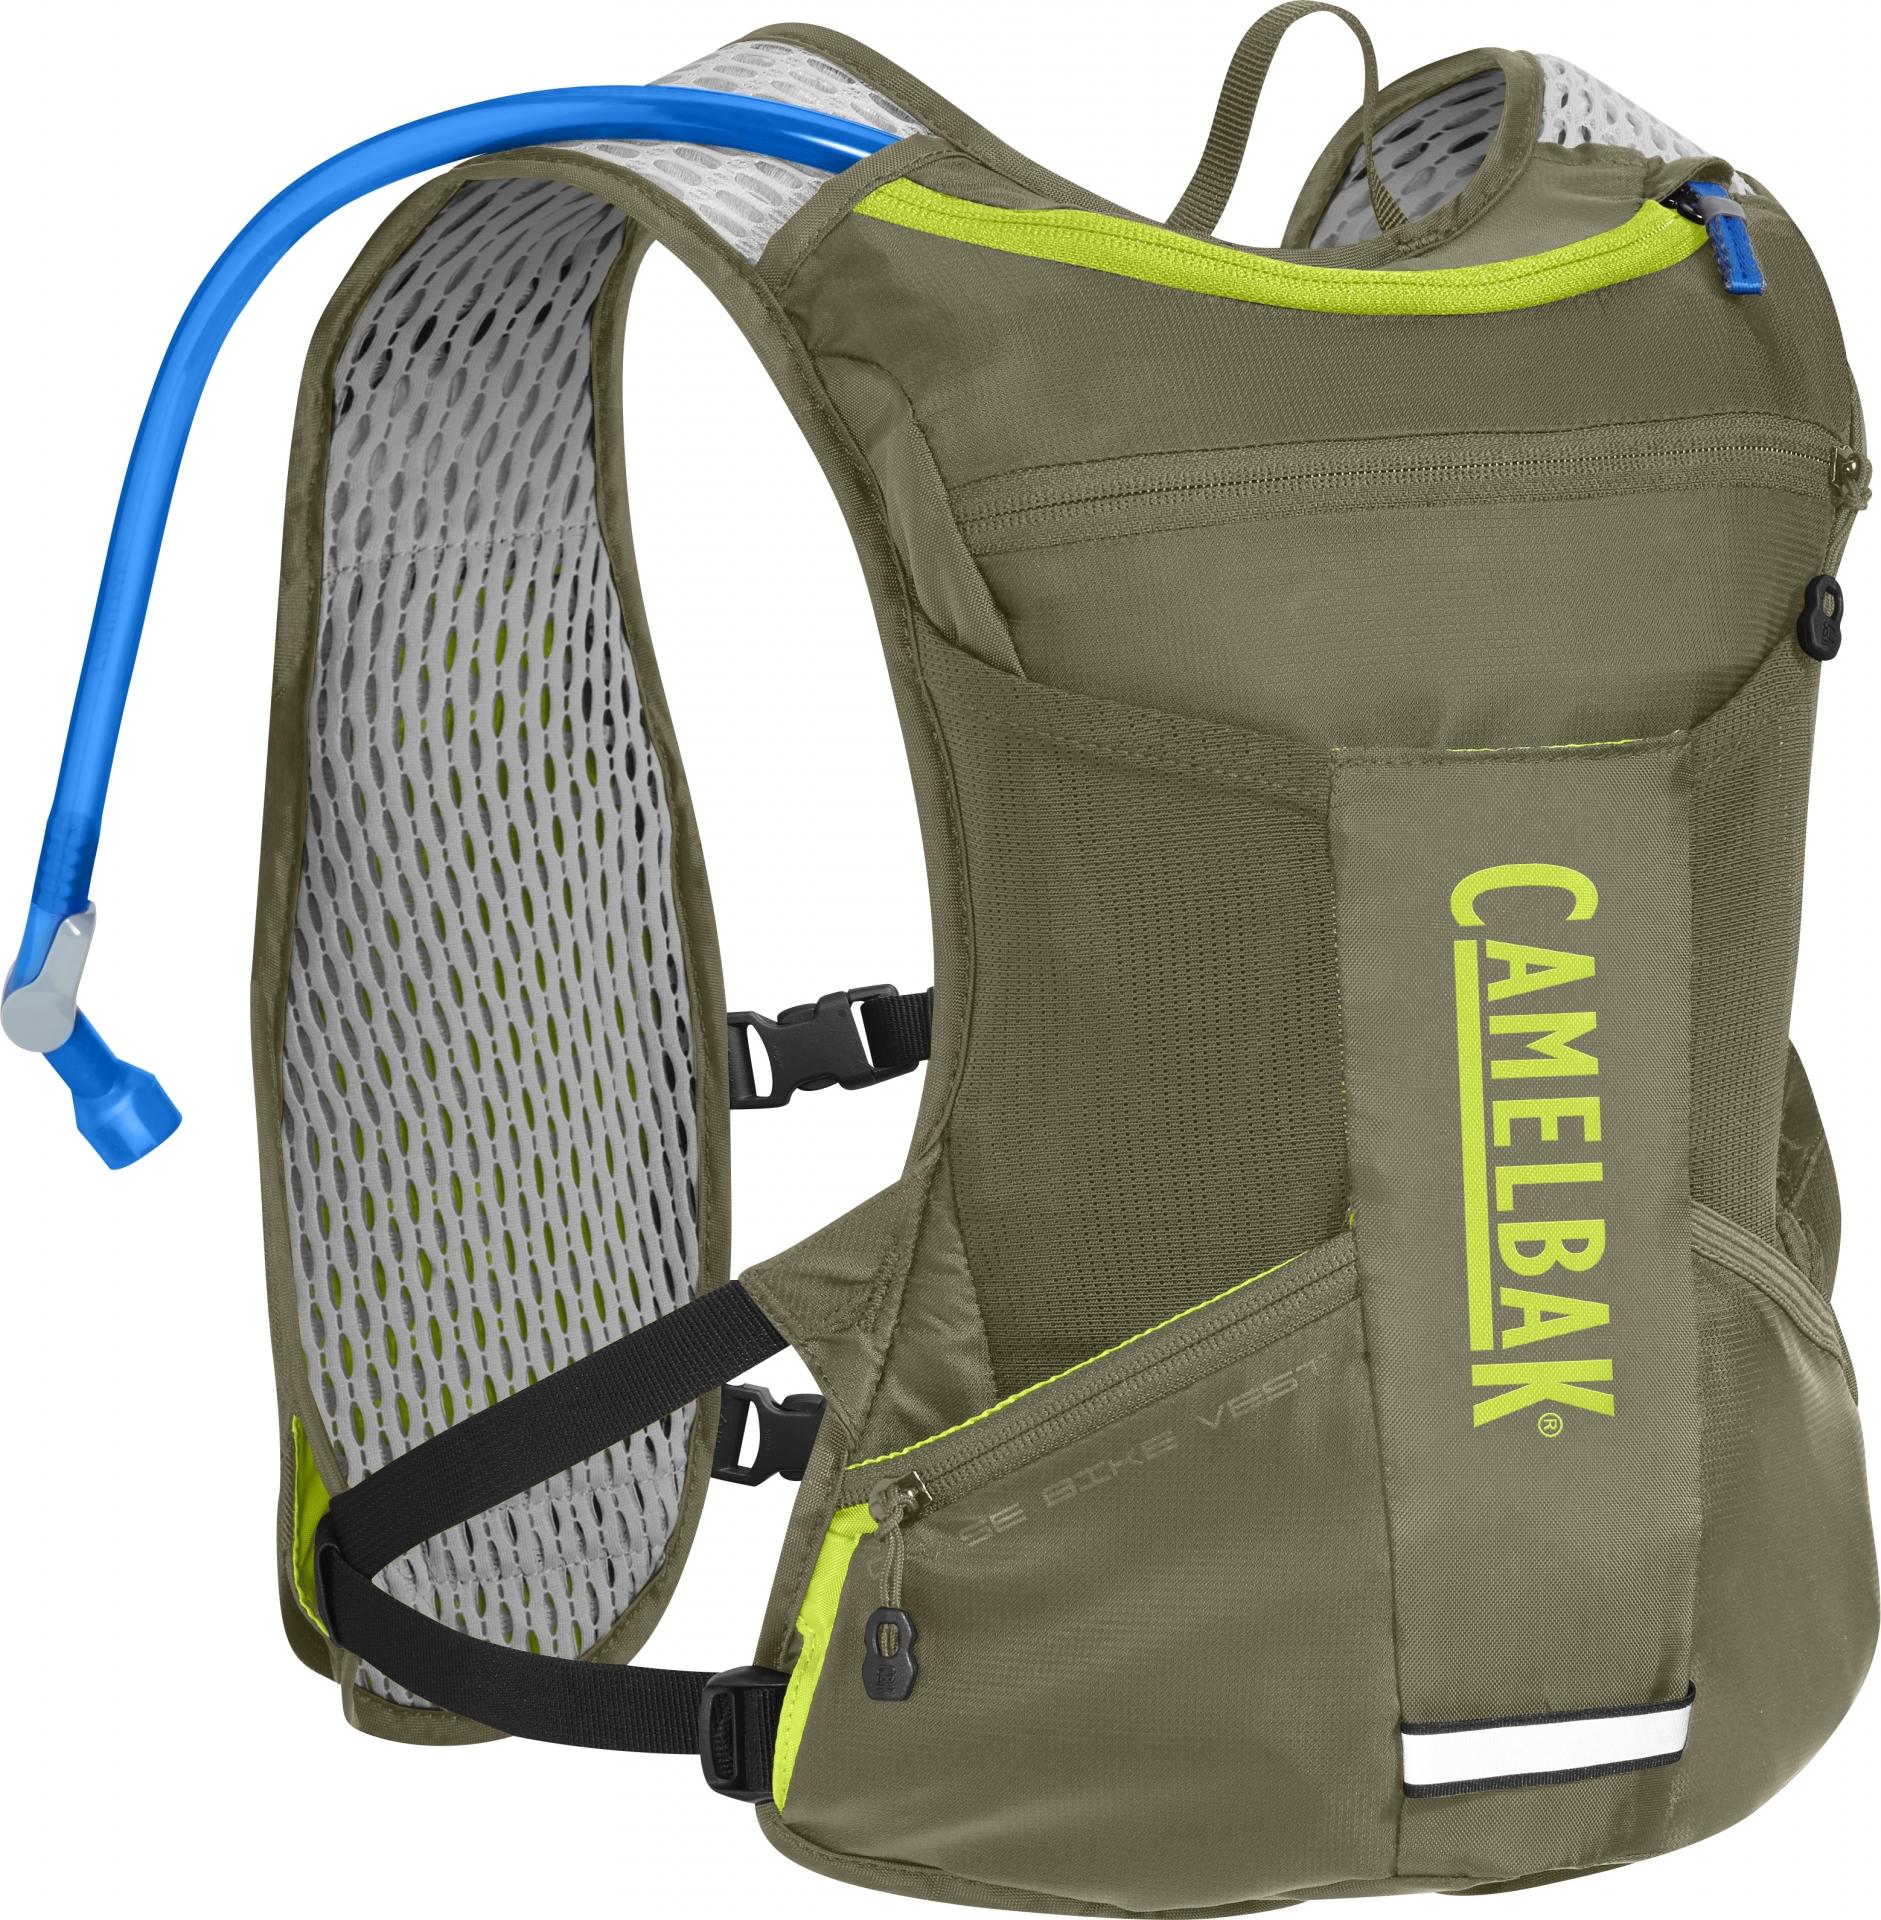 Gilet dhydratation CamelBak Chase Bike Vest 2,5 L Vert Olive Burnt/Lime